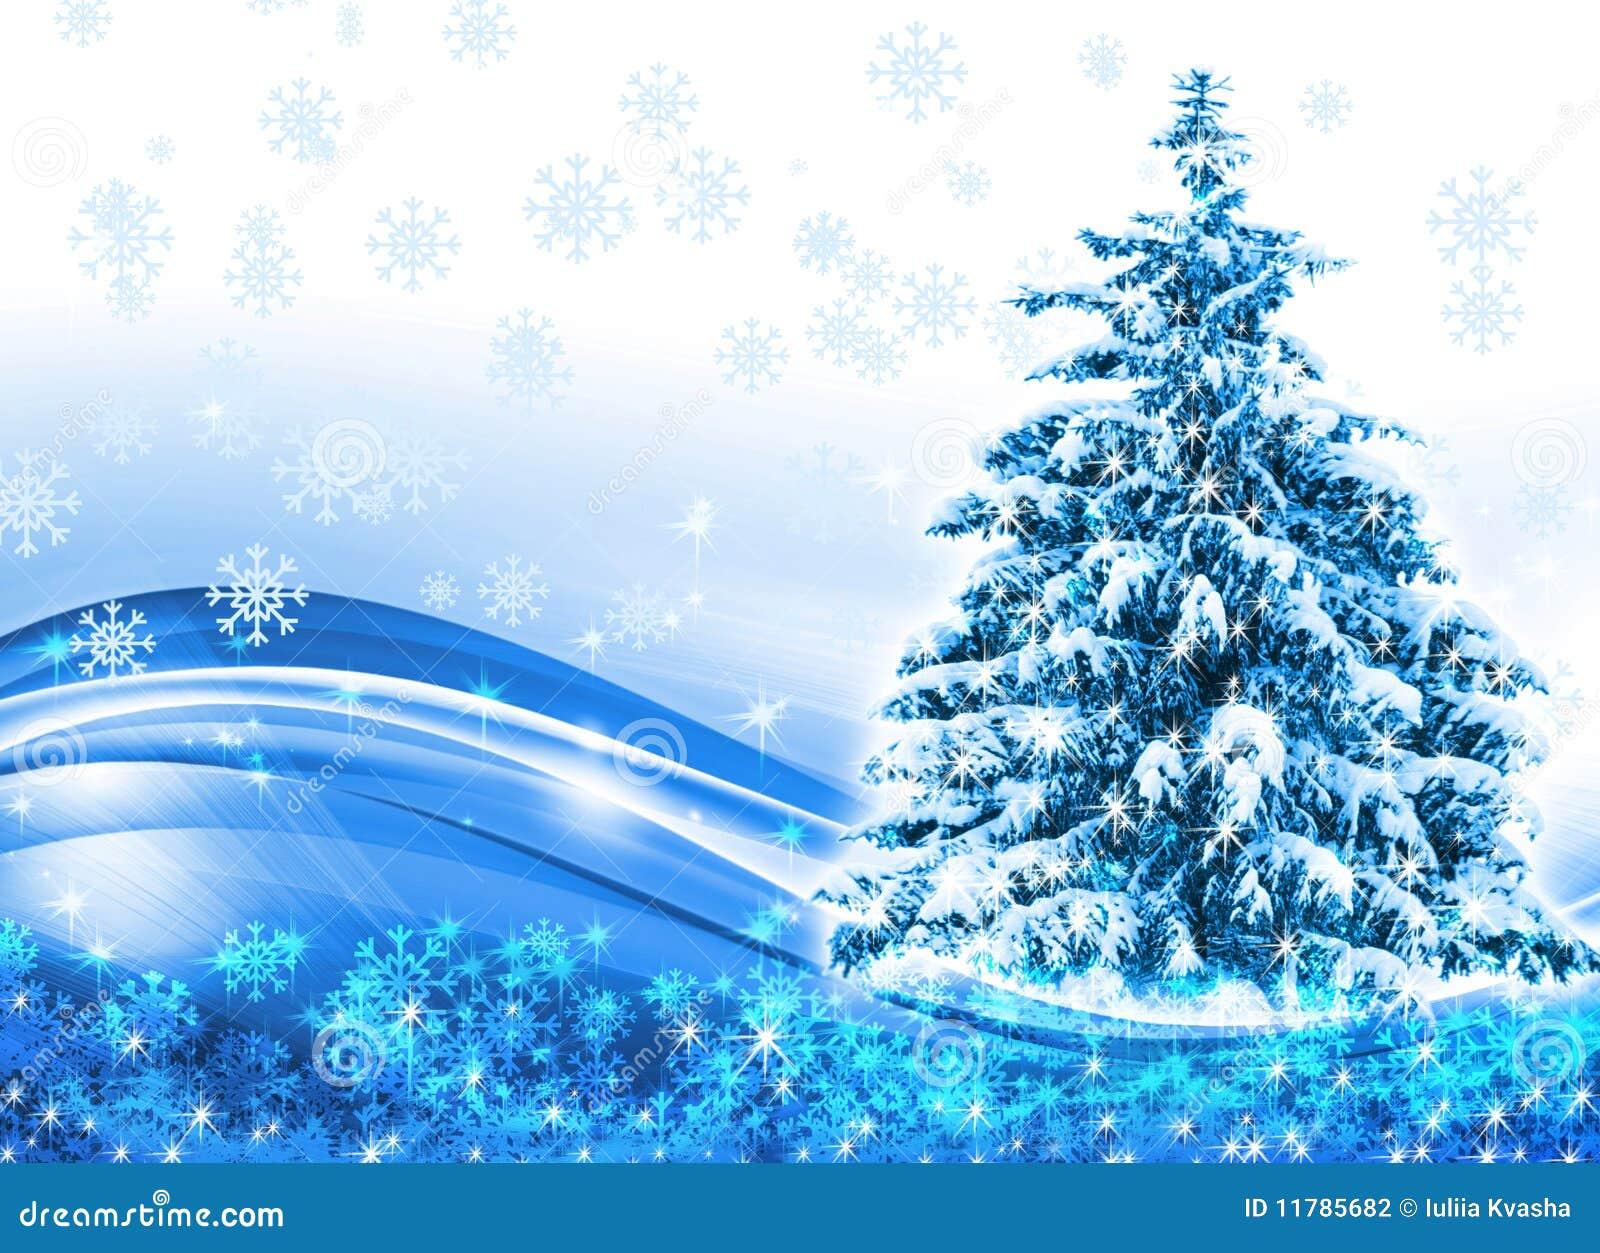 The Best Christmas Background Stock Illustration - Illustration of ...